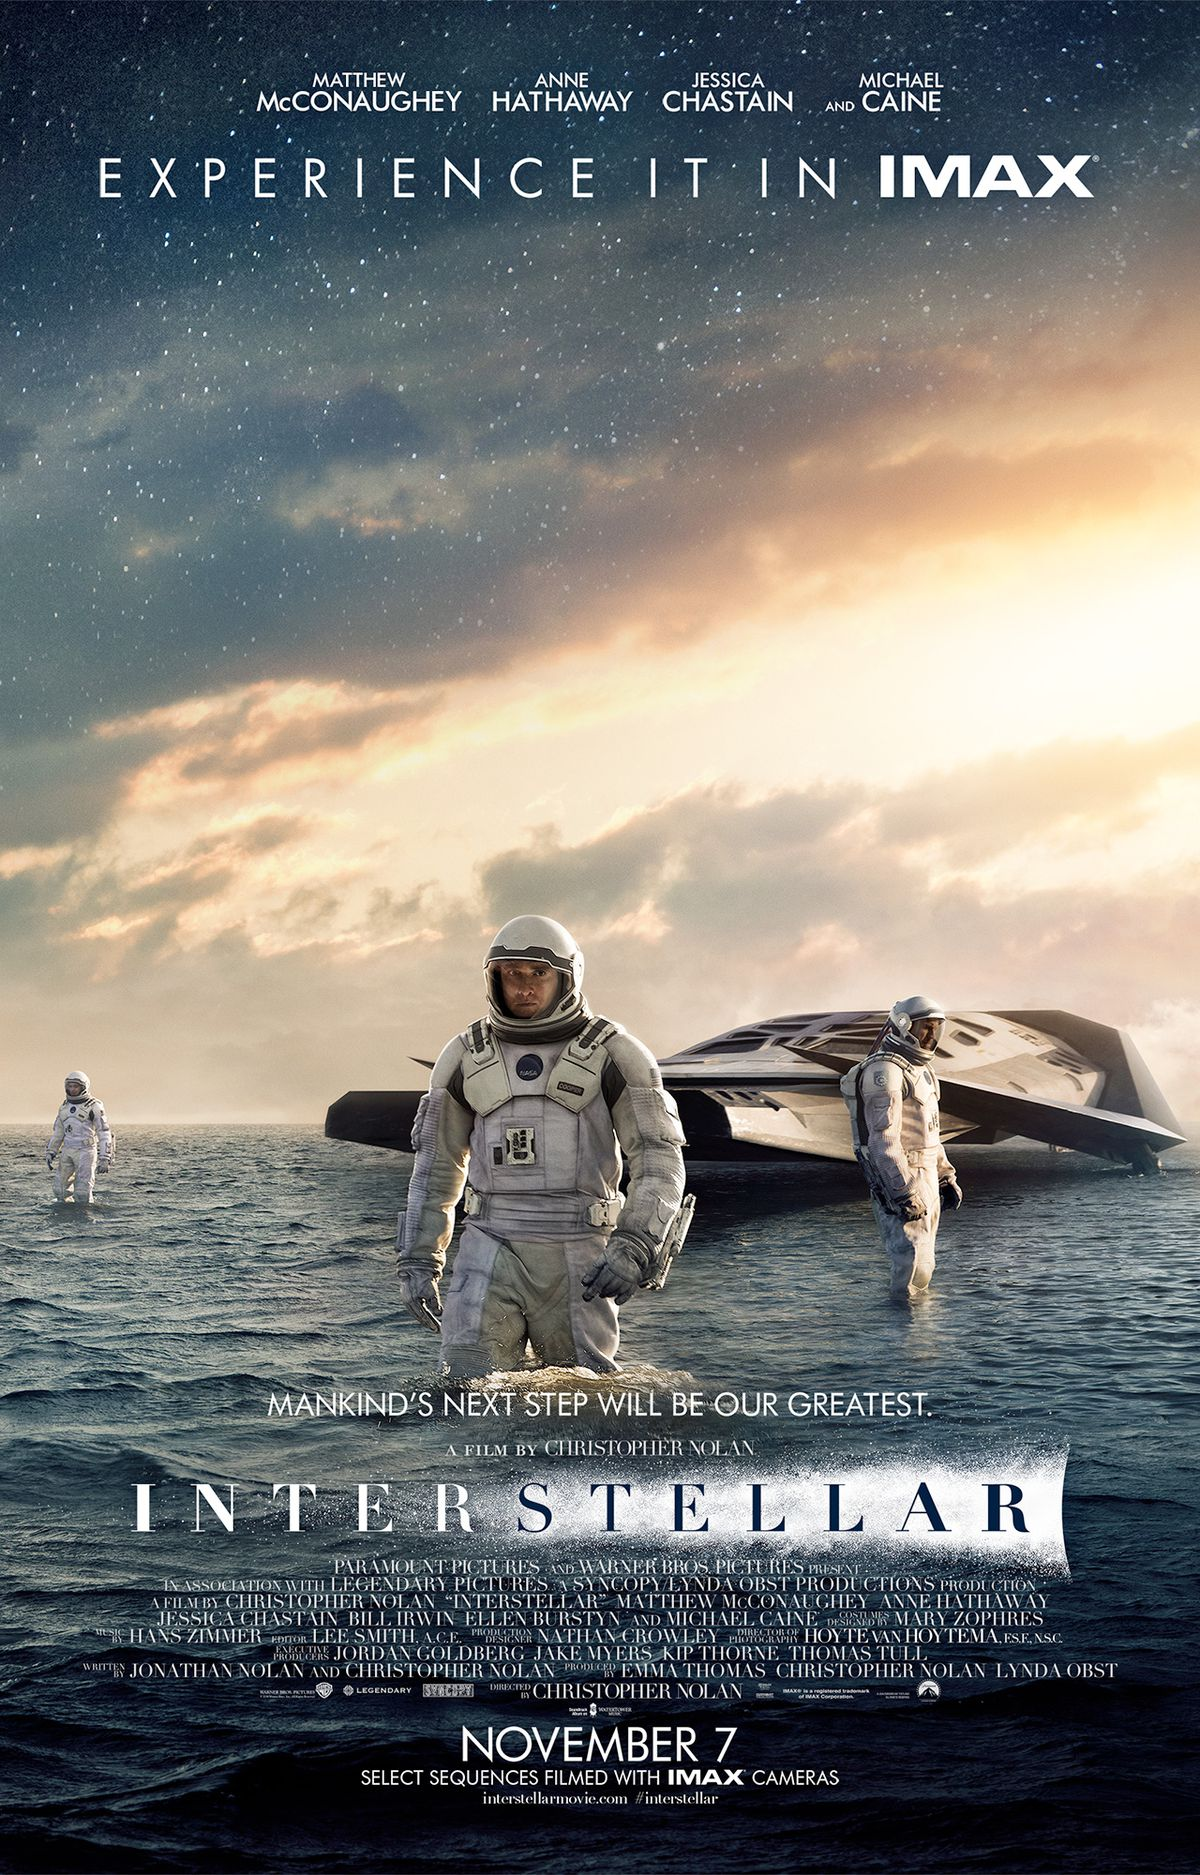 Interstellar IMAX poster 1280